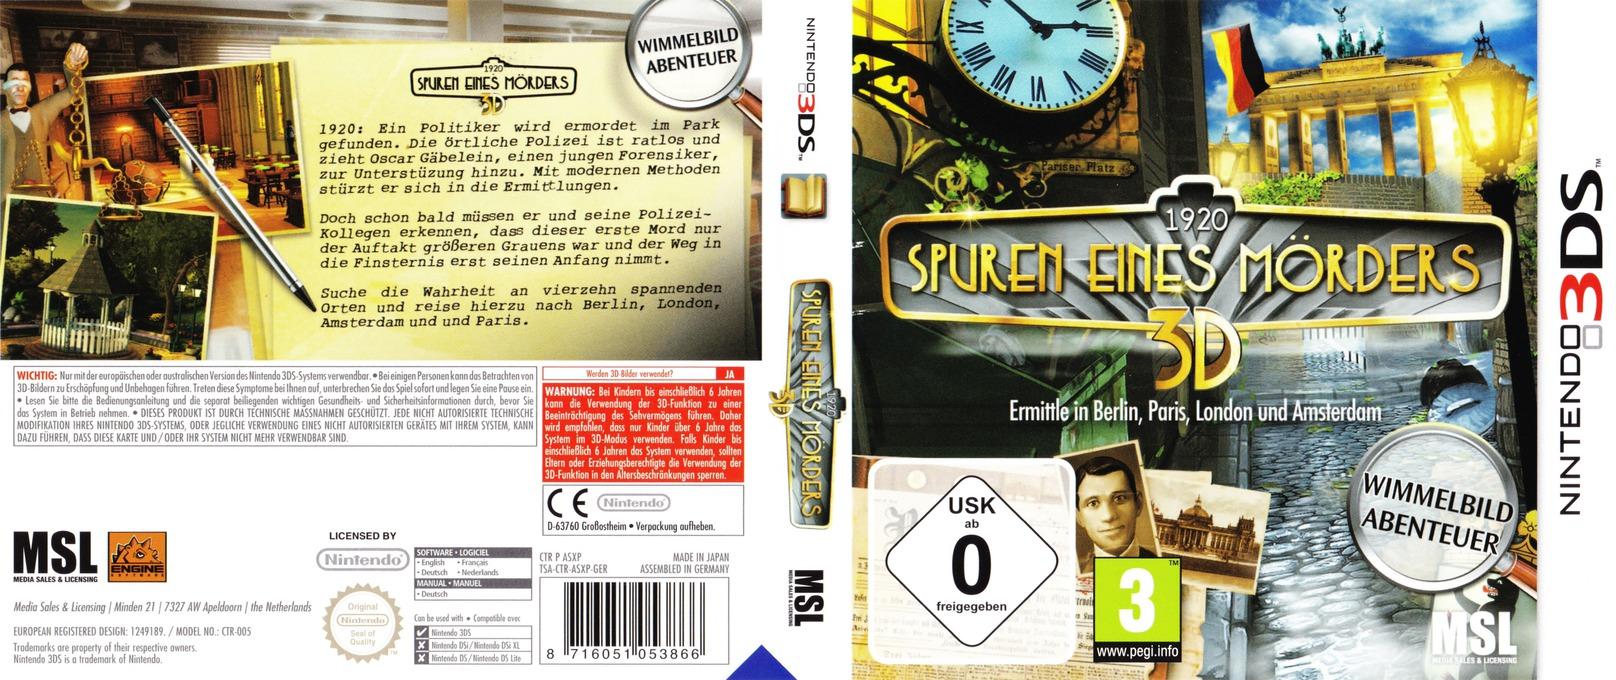 1920 Spuren eines Mörders 3D 3DS coverfullHQ (ASXP)